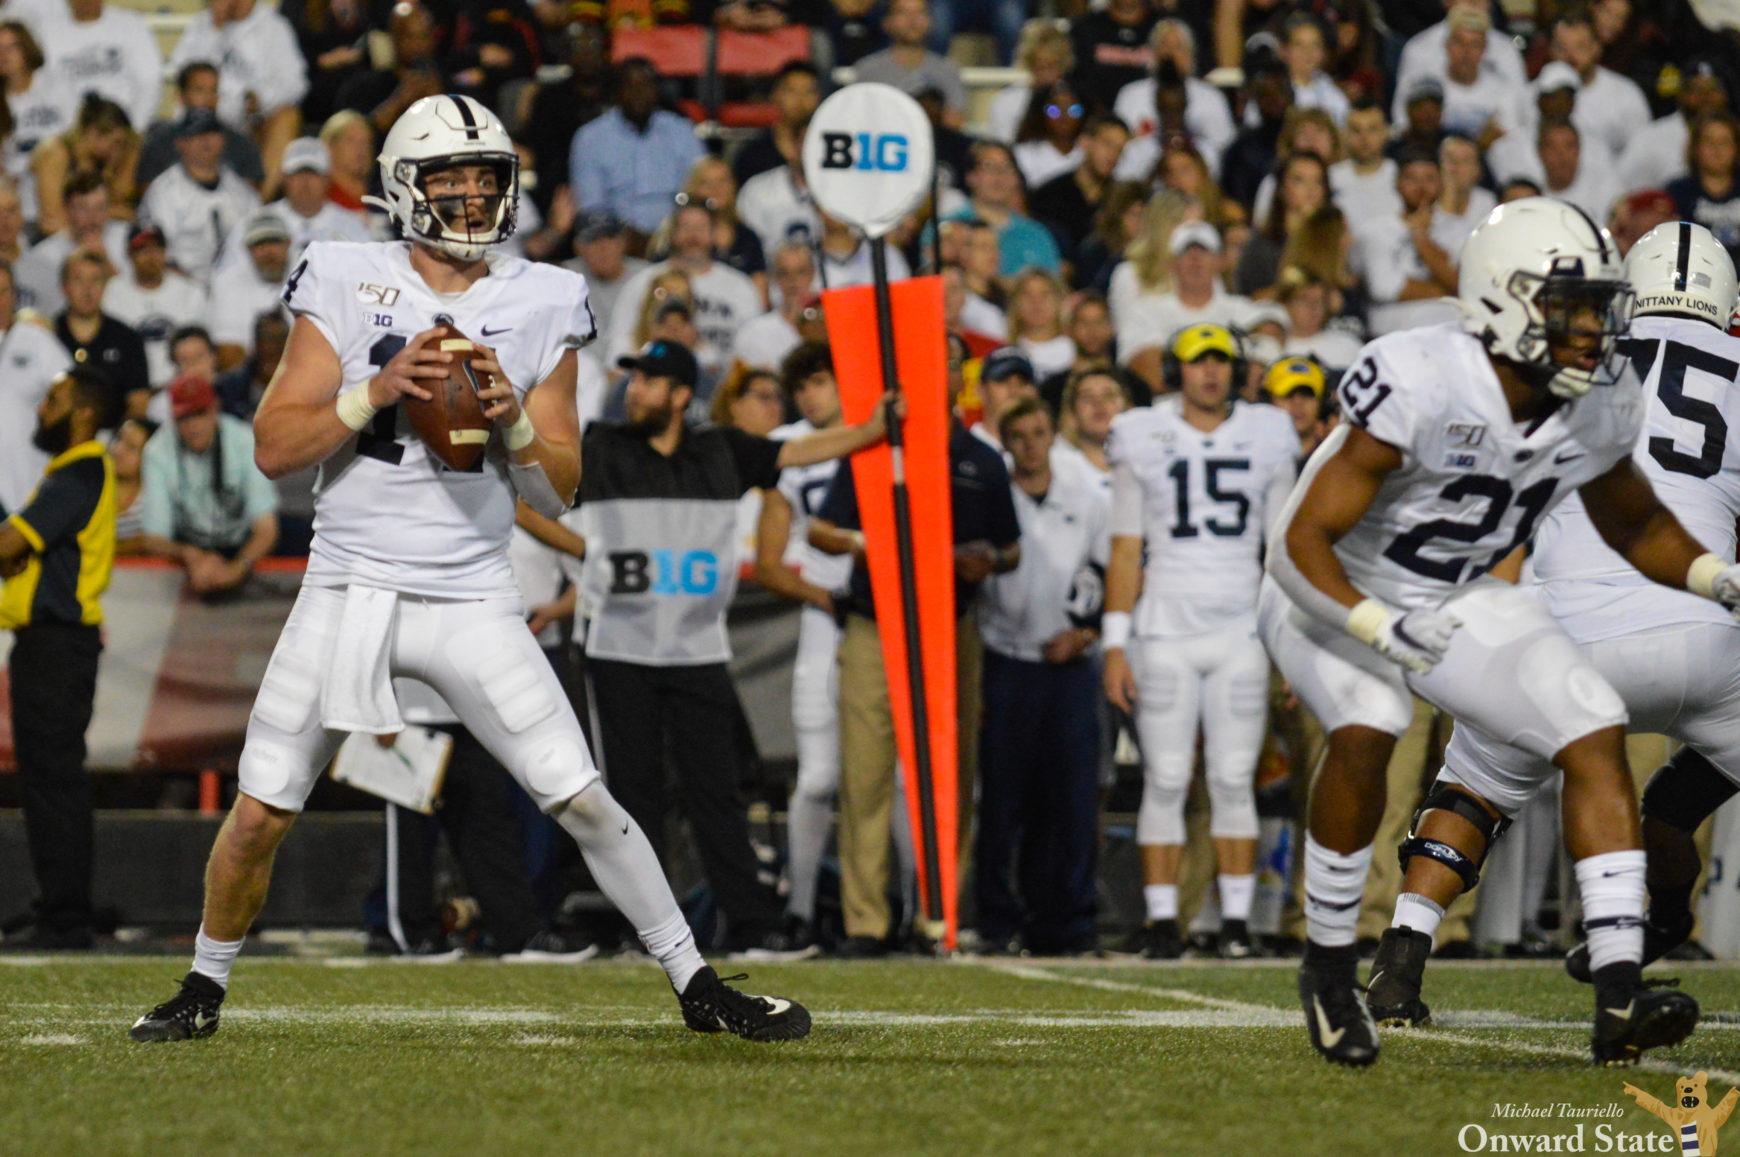 Penn State-Maryland To Kick Off At 3:30 P.M. | Onward State